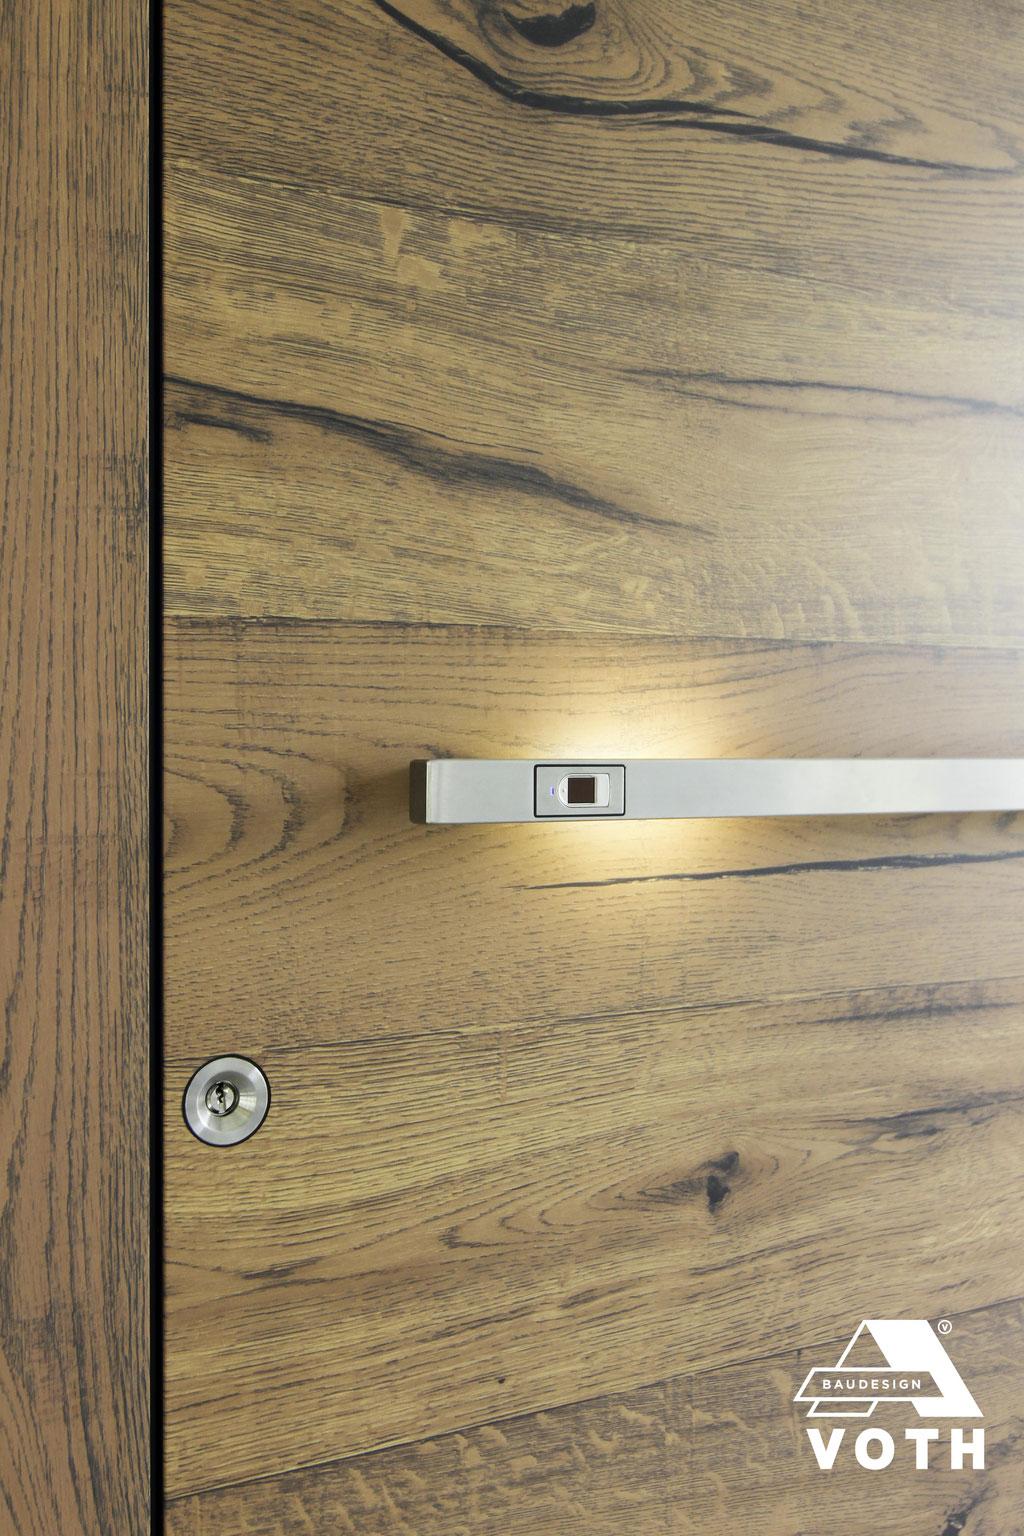 Schüco Haustüre aus Aluminium in Alt-Holz Oberfläche